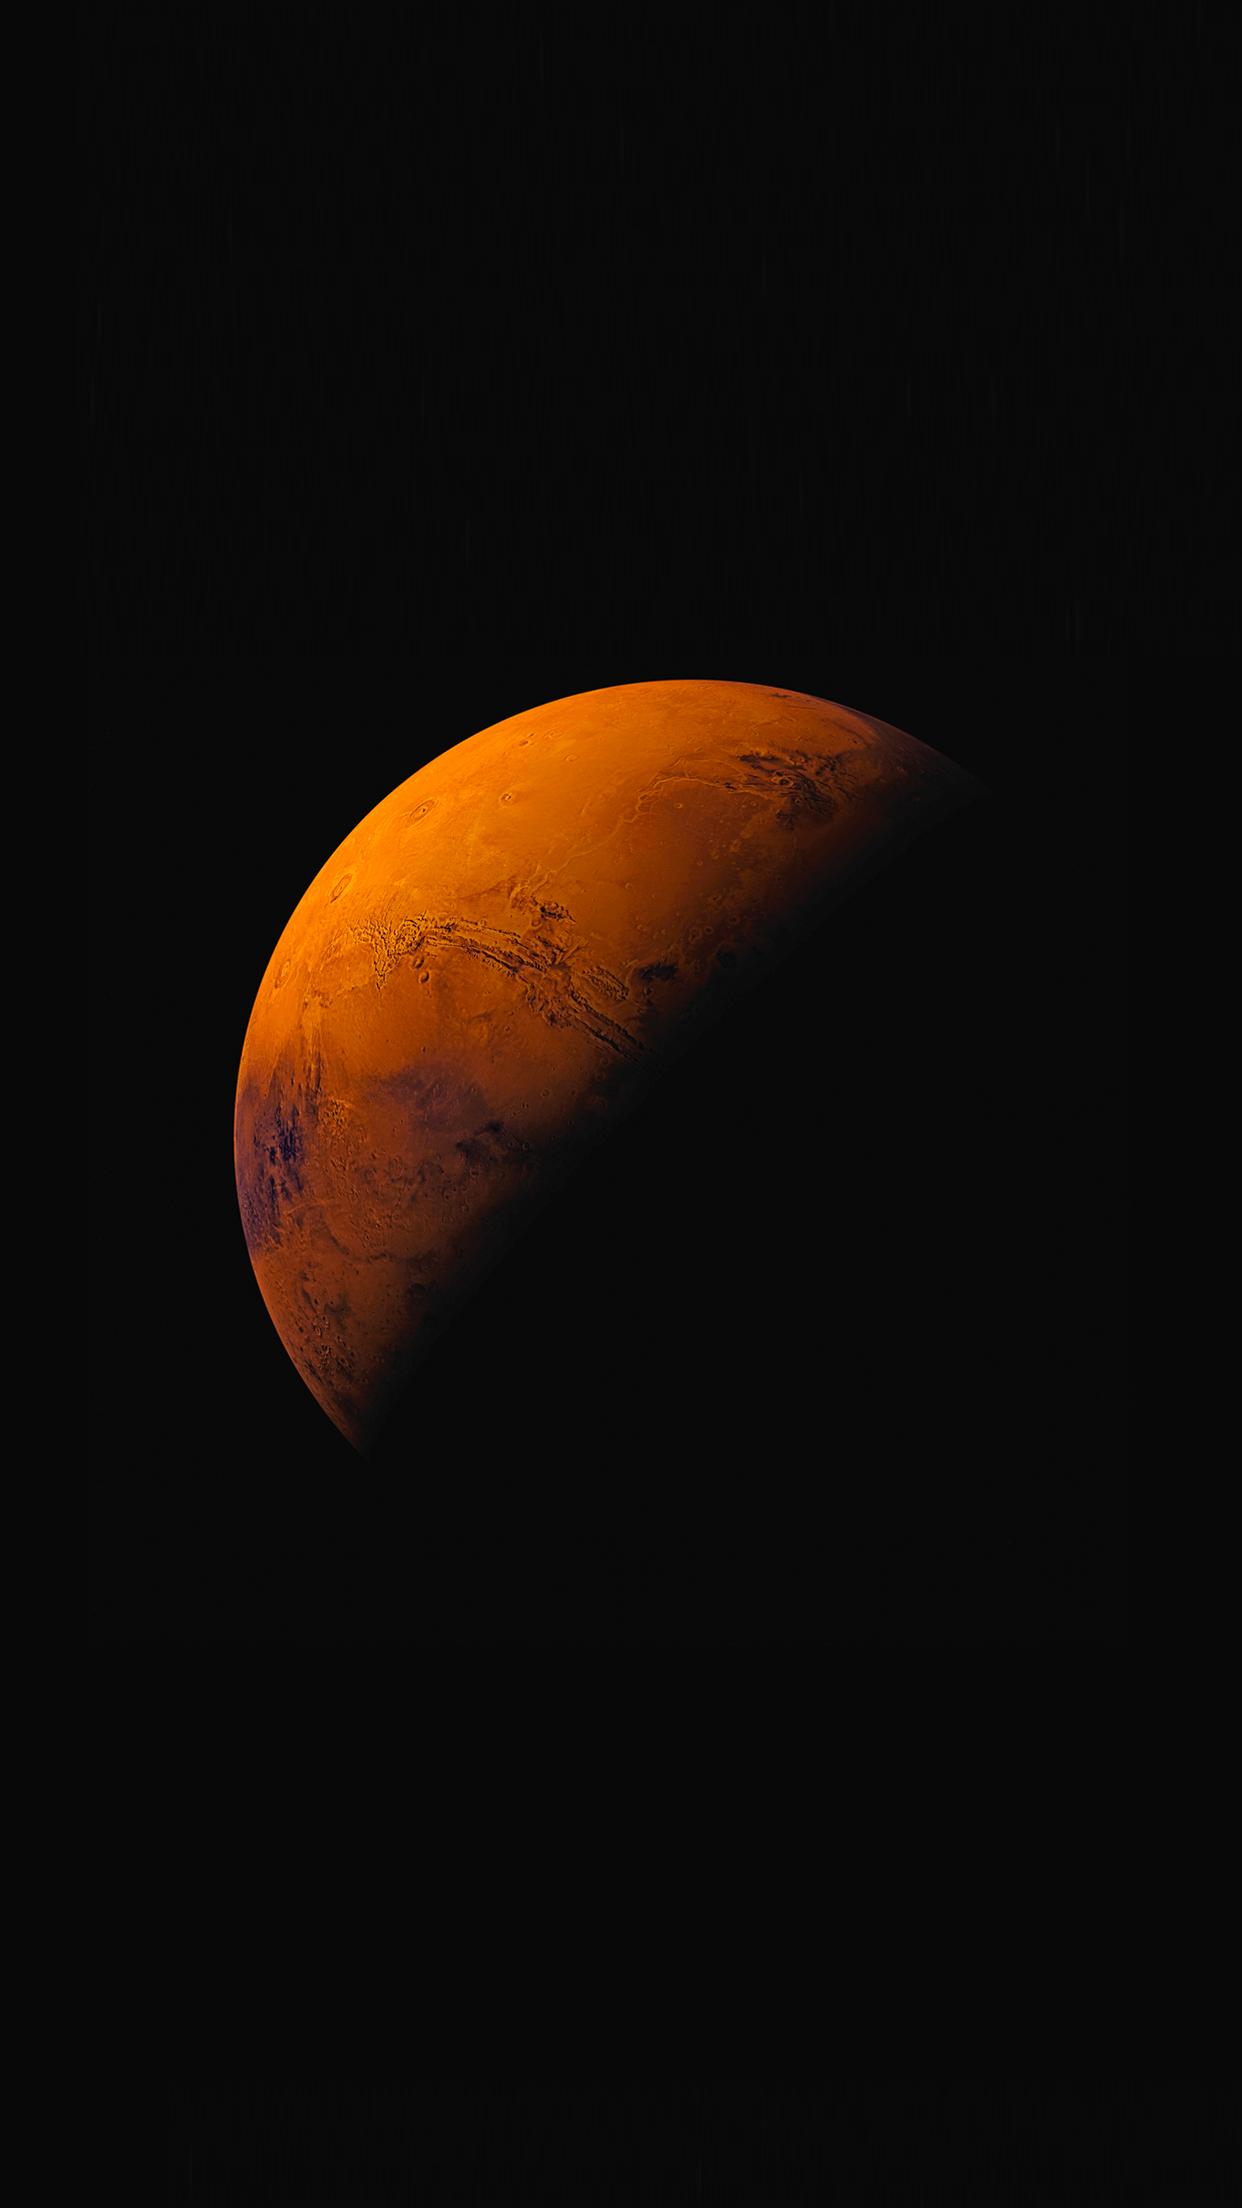 IOS 9 Orange Moon Wallpaper ...